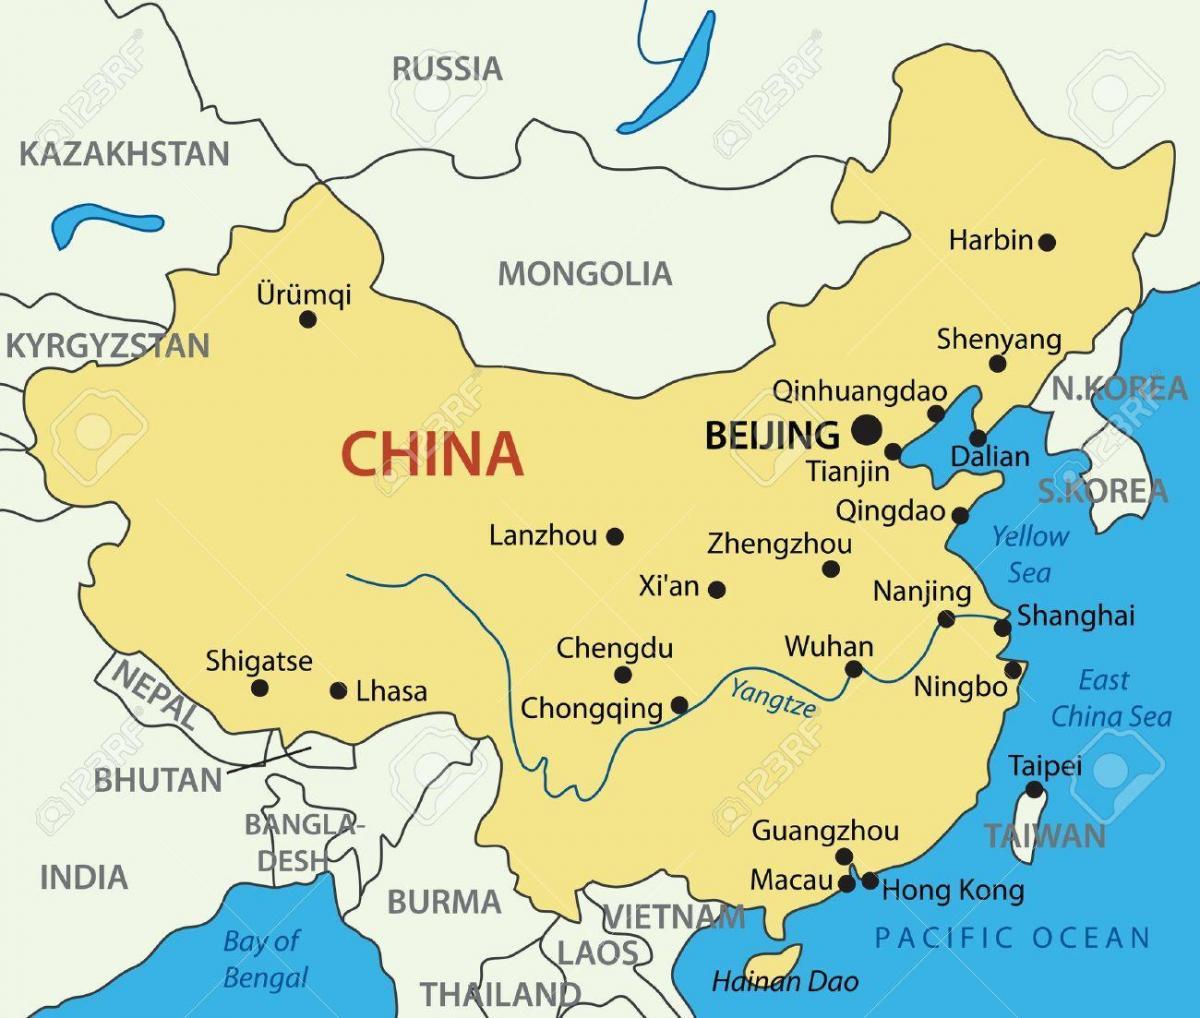 Map of china yellow sea yellow sea china map eastern asia asia yellow sea china map gumiabroncs Gallery